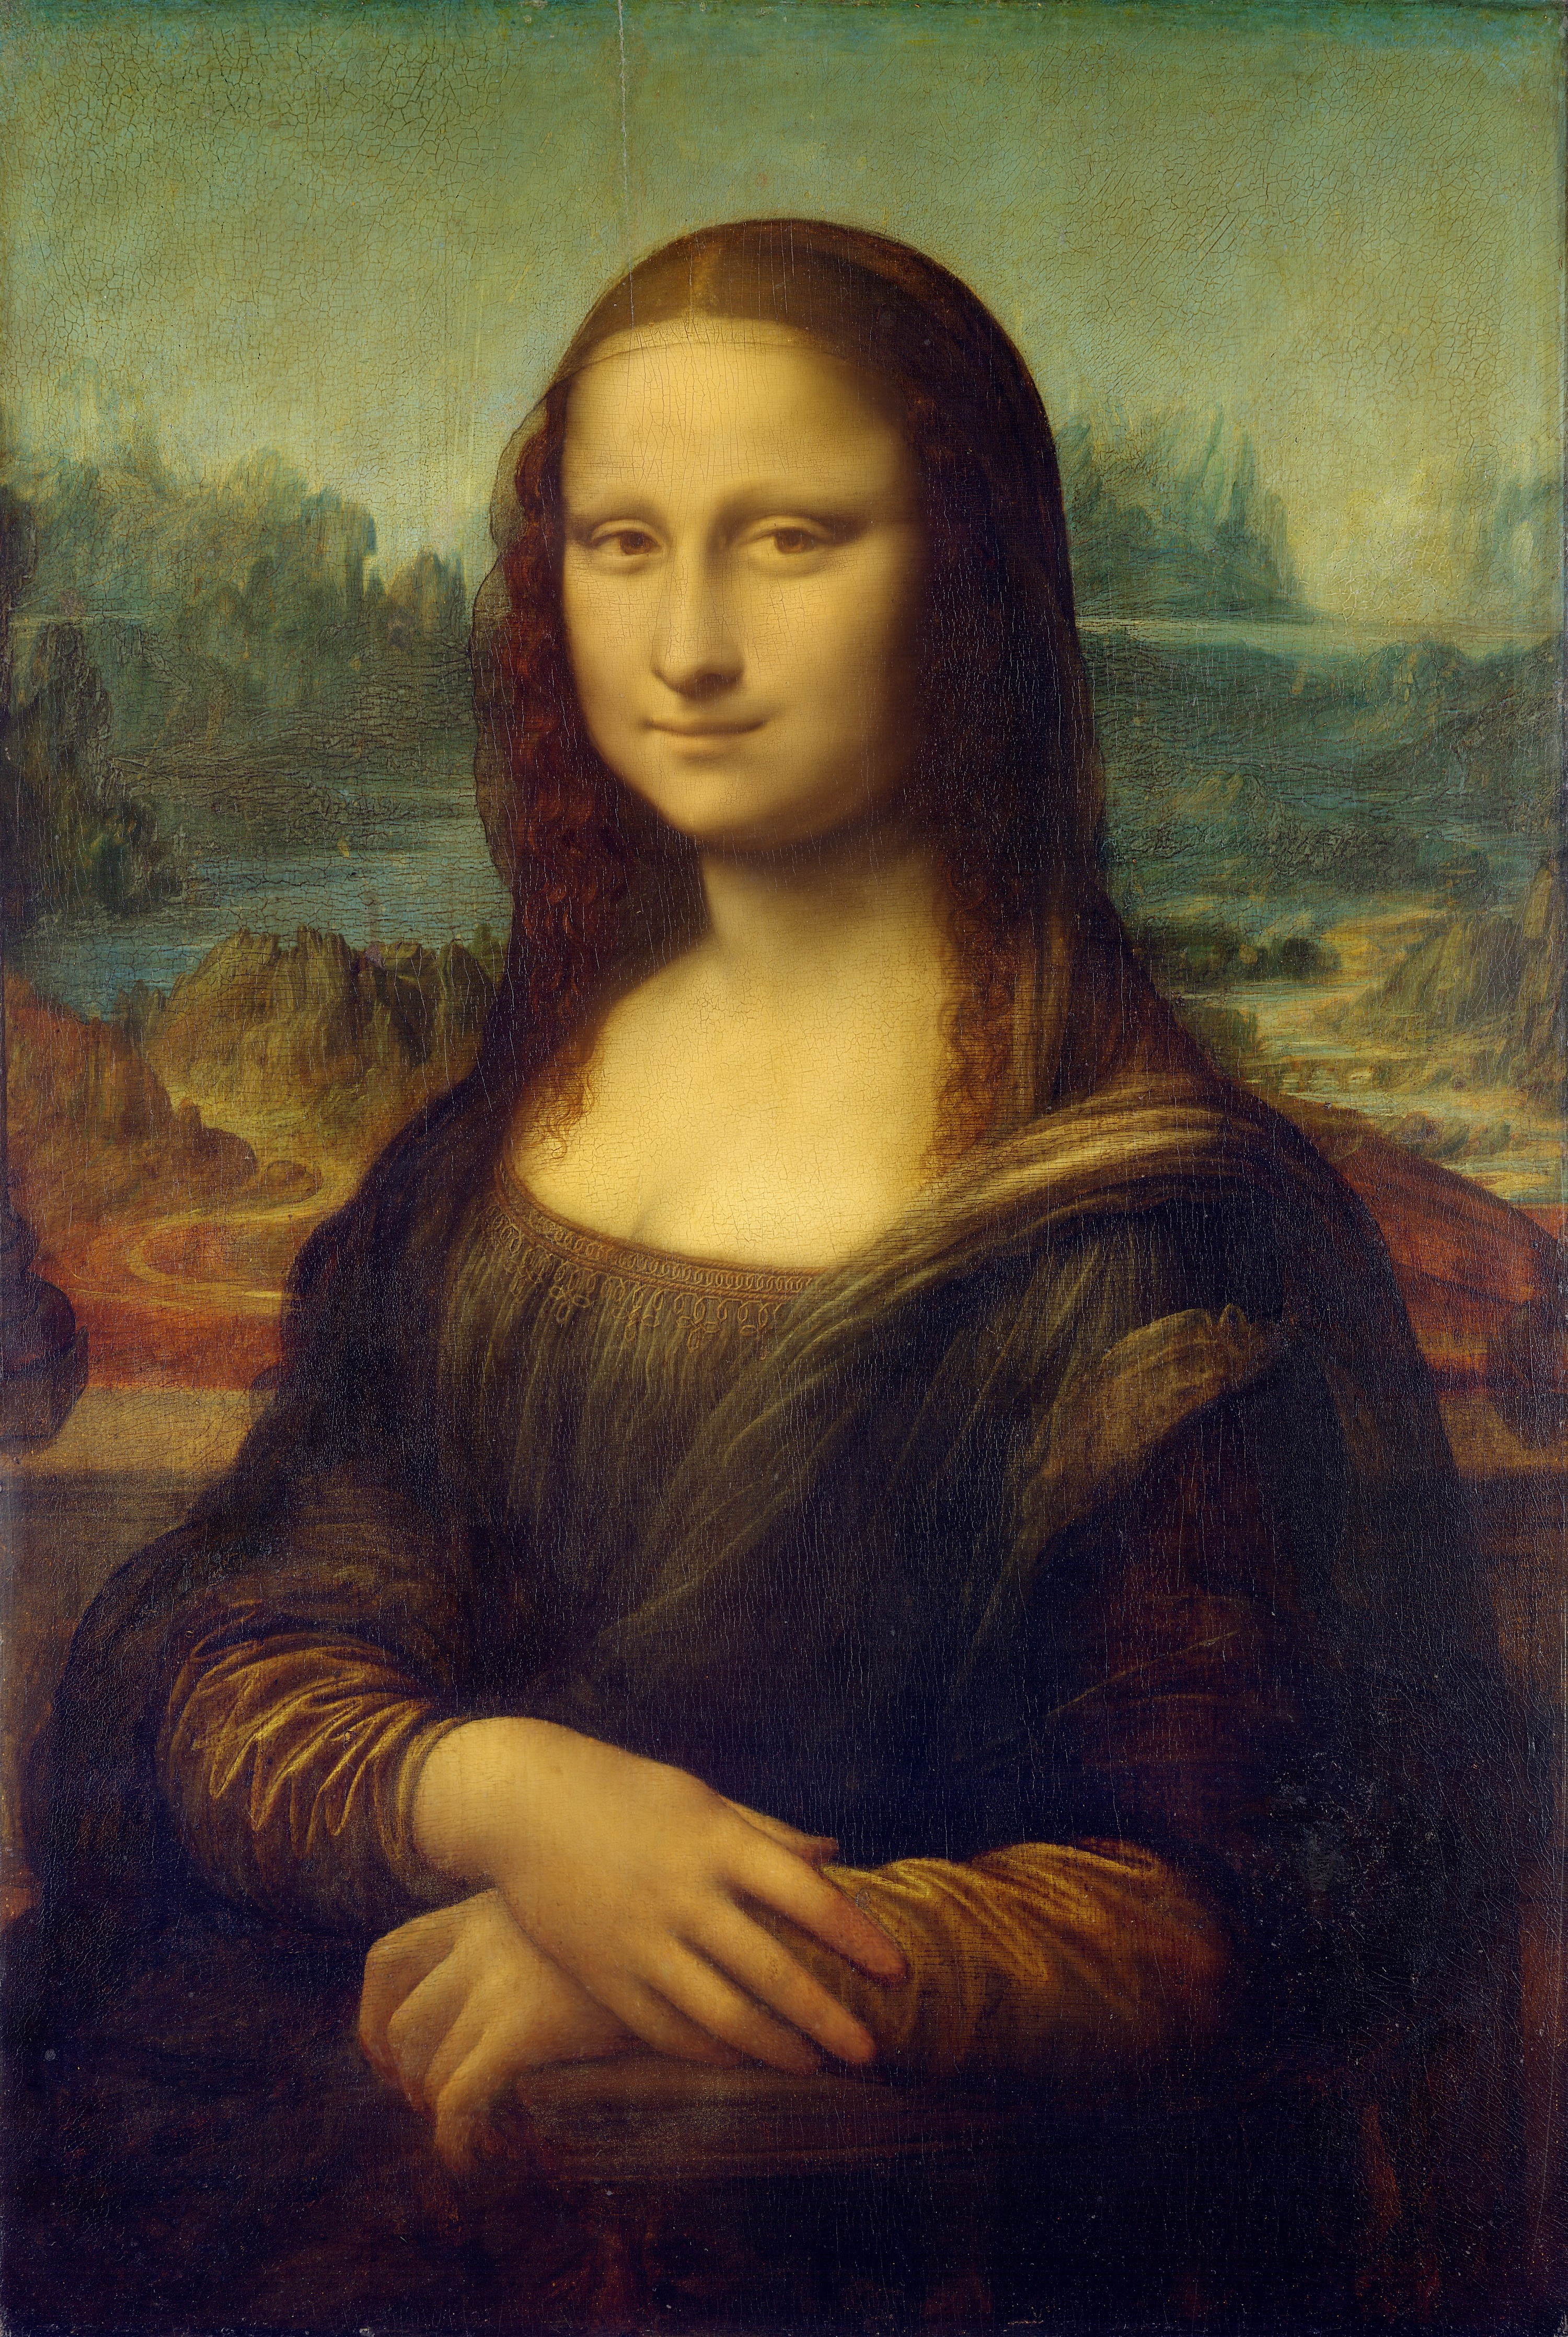 General 3000x4471 Mona Lisa Leonardo da Vinci classical art painting